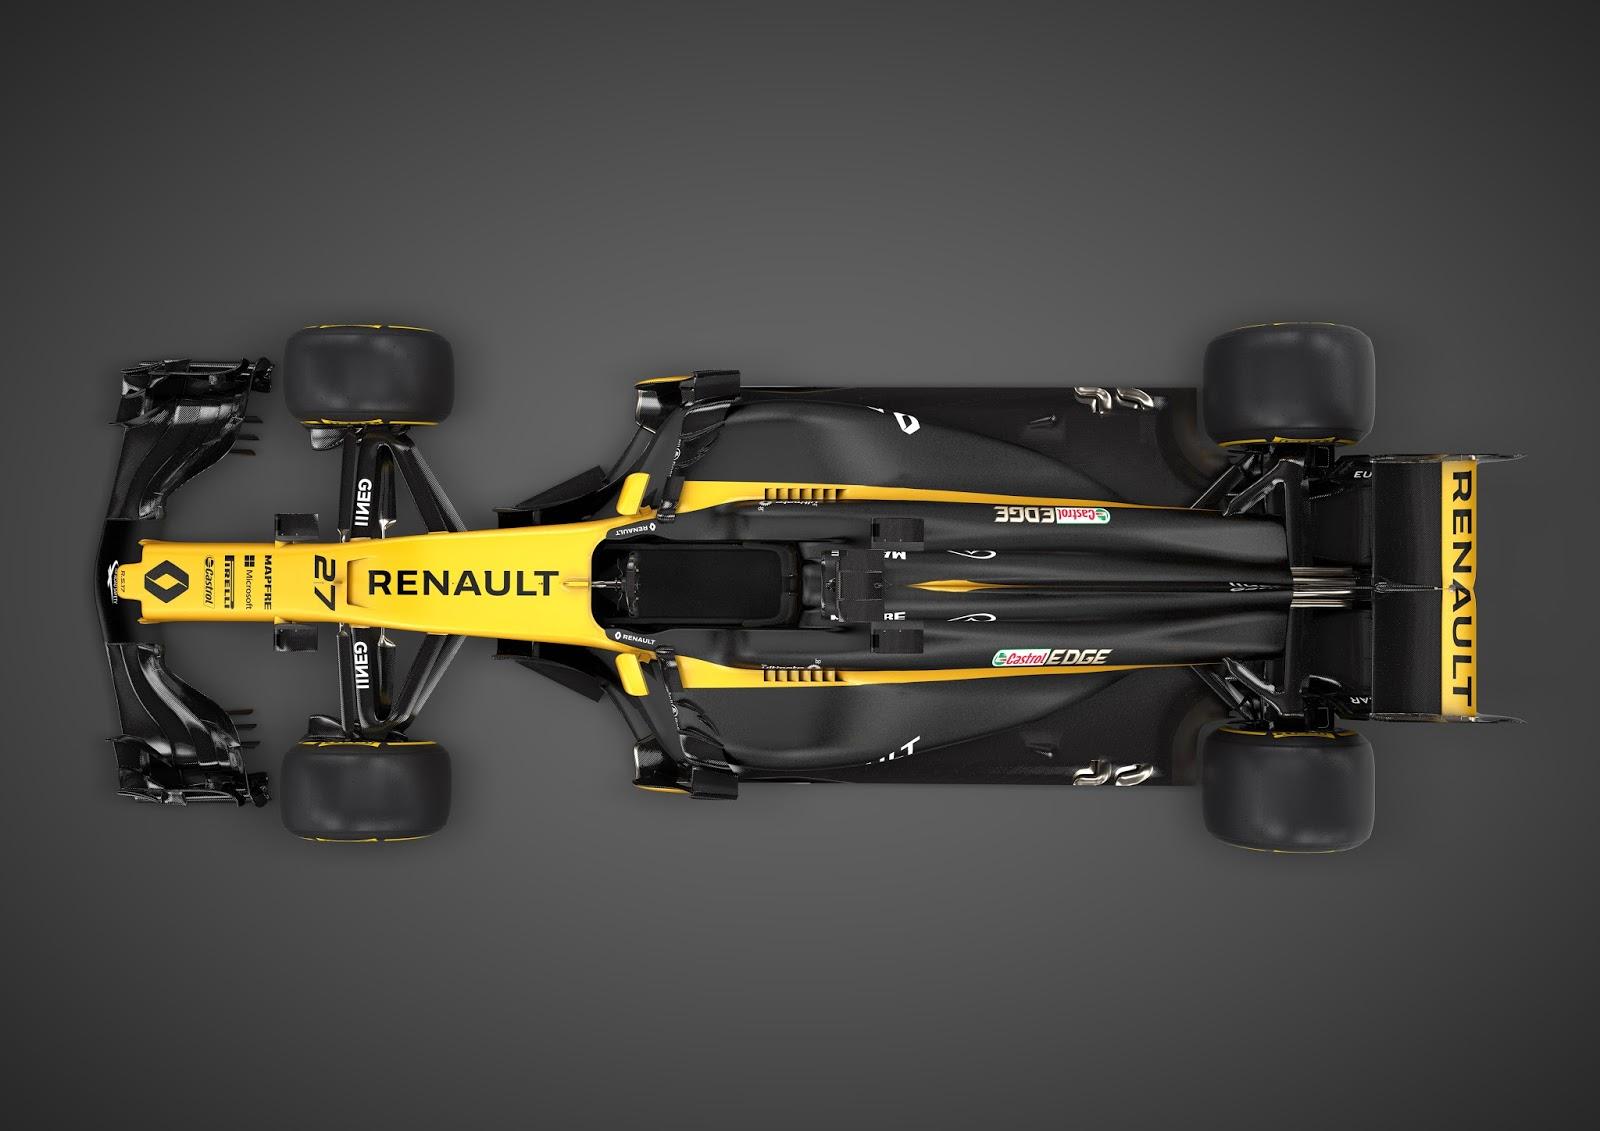 A3 RS17 Plan dark studio 1 Η Renault Sport παρουσίασε το καινούργιο της μονοθέσιο, την R.S.17 F1, Formula 1, Renault, Renault Sport Formula 1 Team, videos